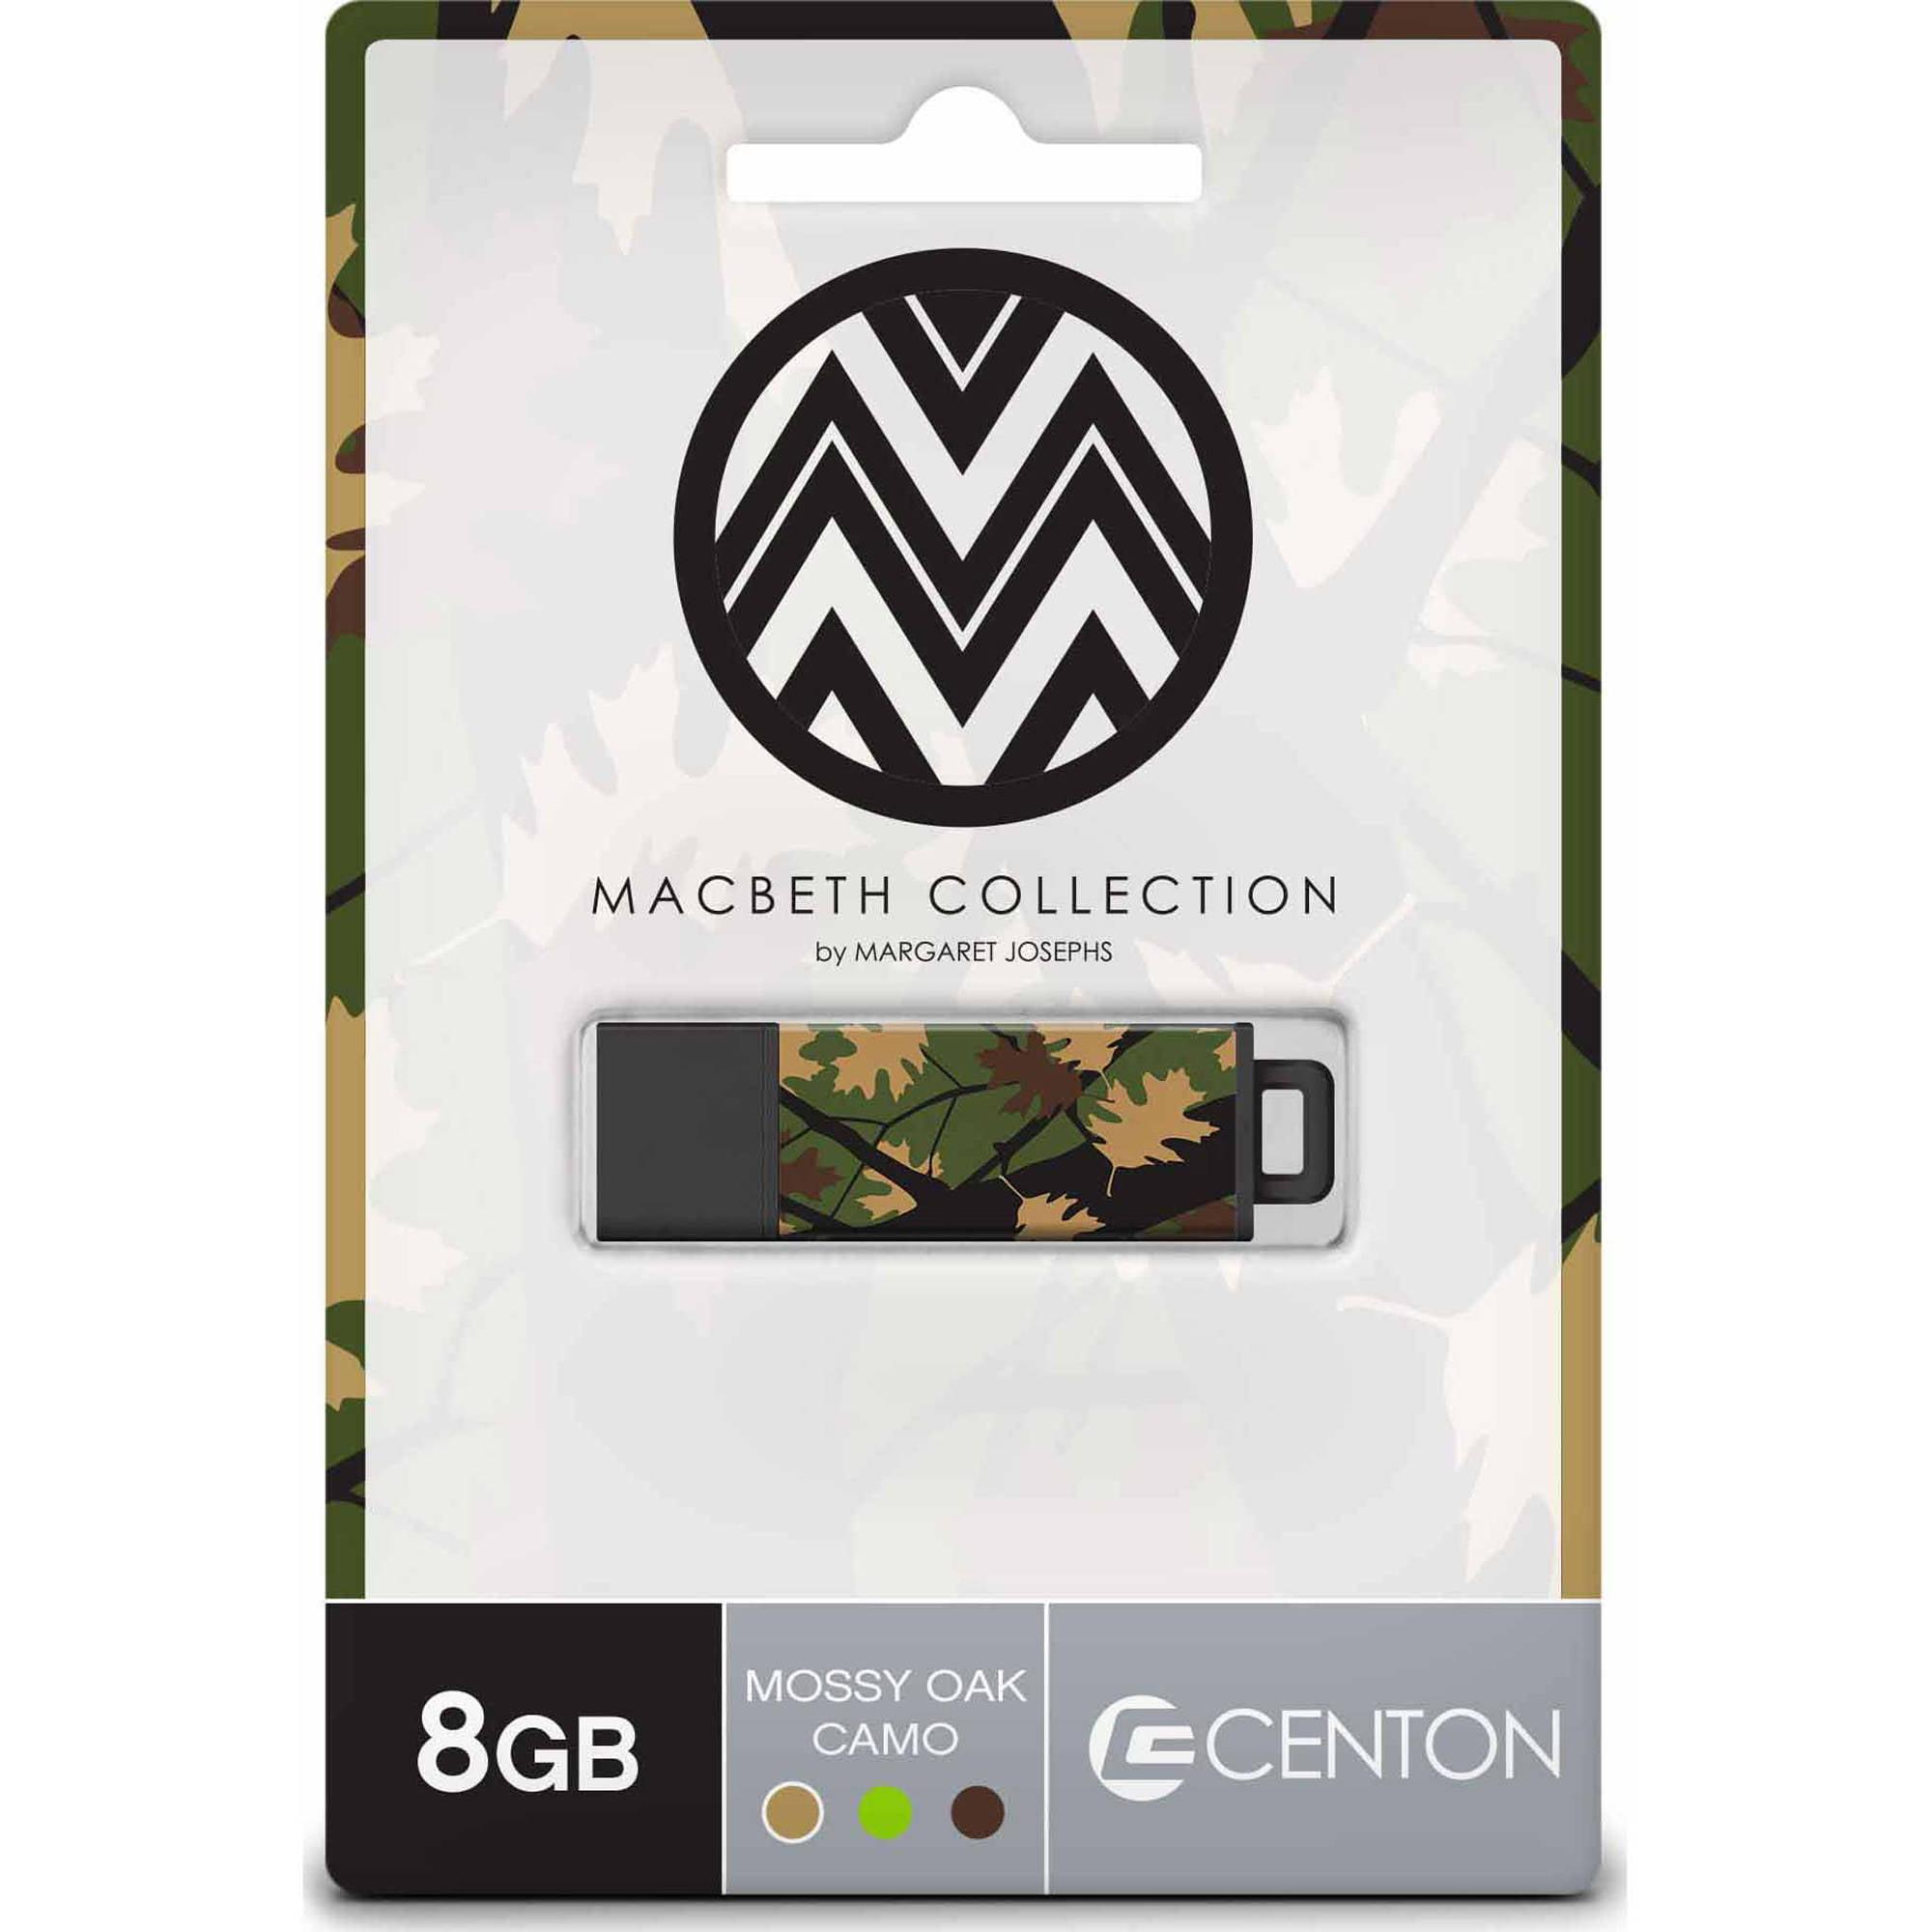 Centon 8GB PRO2 Macbeth USB Flash Drive, Mossy Oak Camo